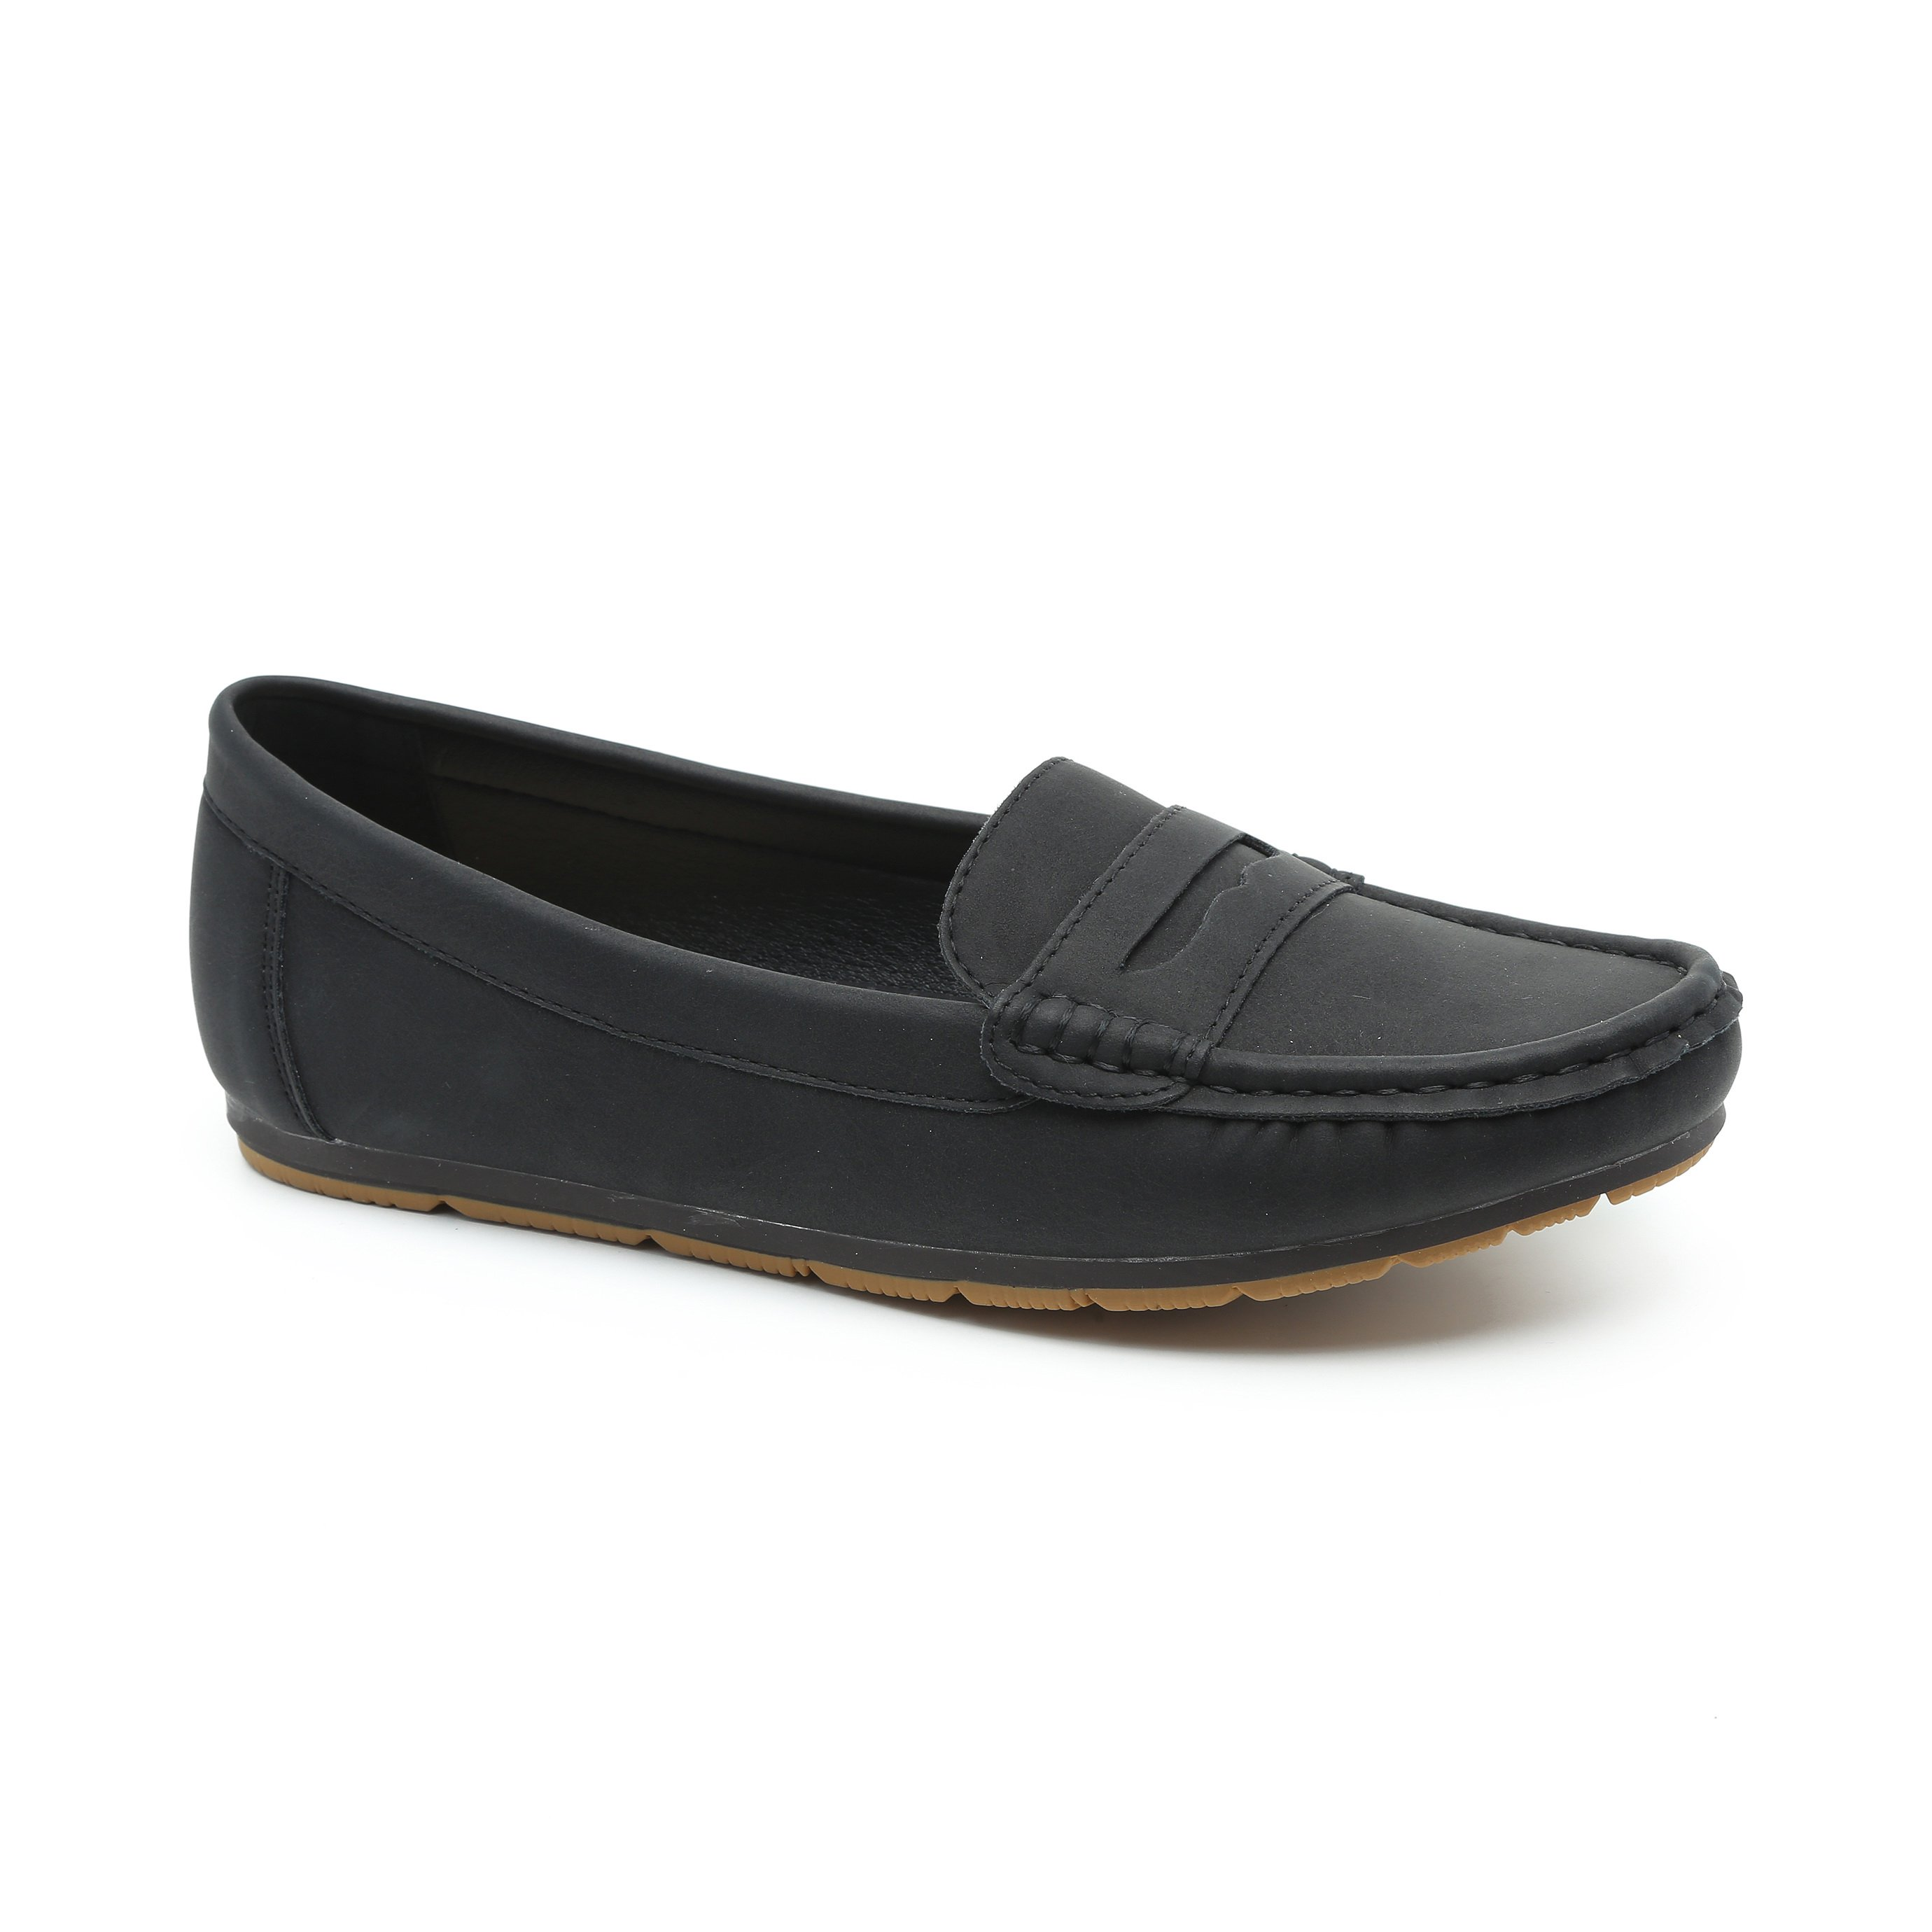 Seventy Nine - נעלי מוקסין במראה רטרו בצבע שחור